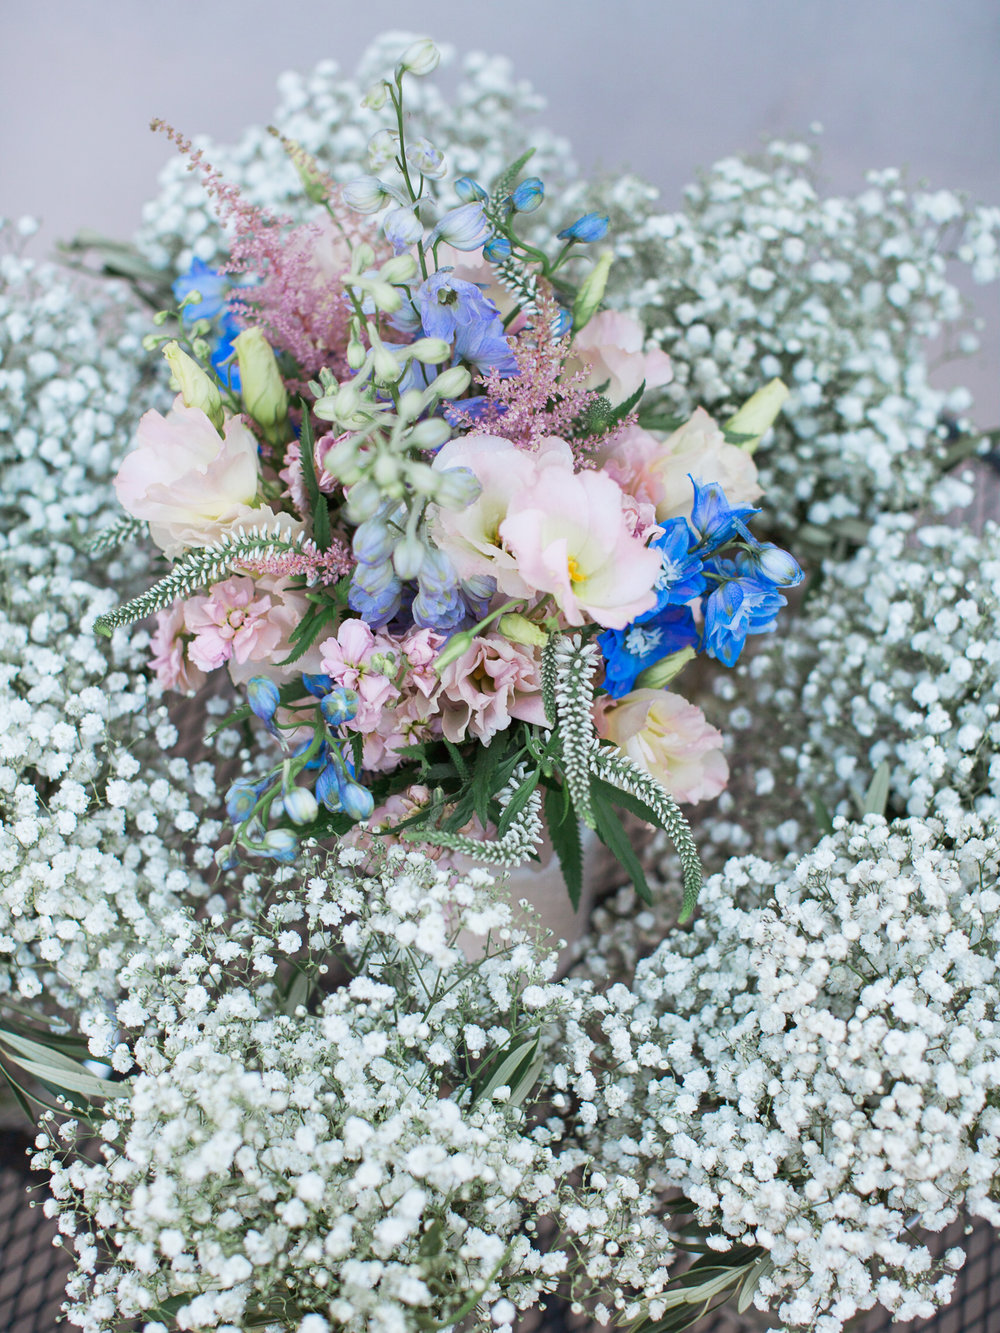 www.santabarbarawedding.com | Santa Barbara Zoo | Kiel Rucker | Rincon Catering | Flowers